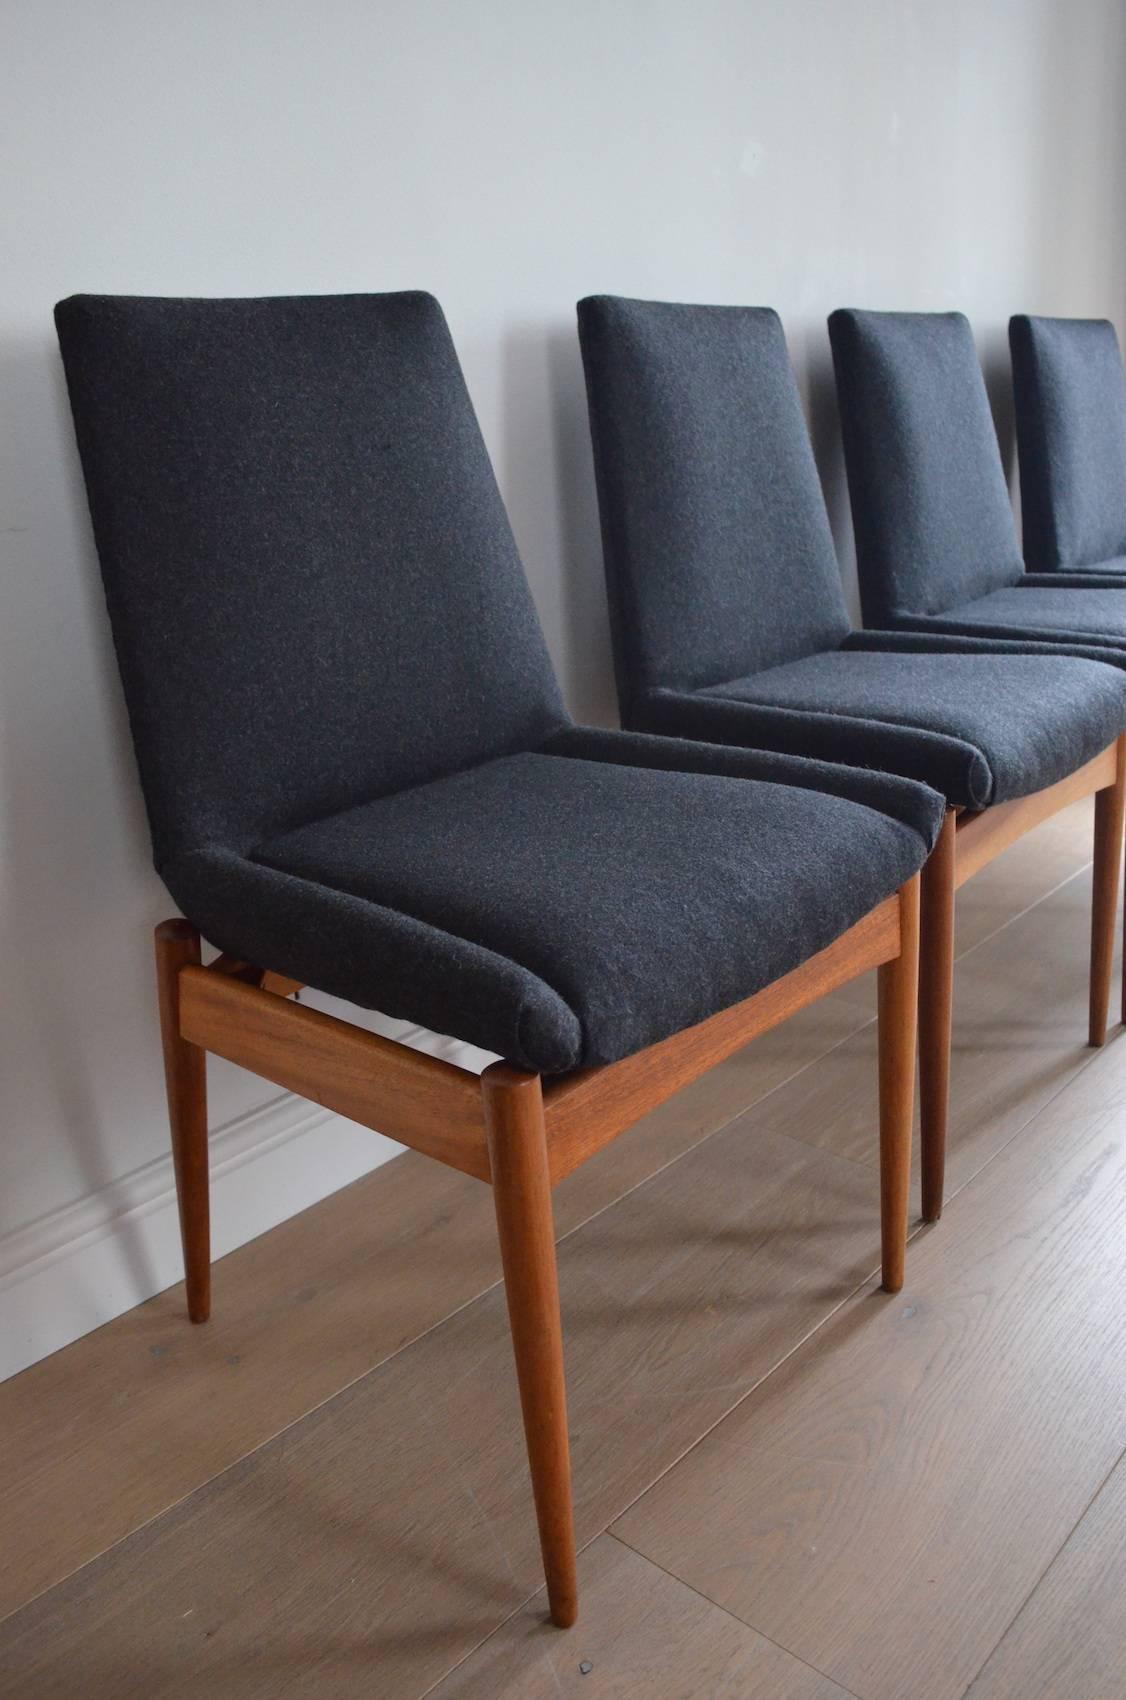 Robert Heritage Hamilton Dining Chairs At 1stdibs